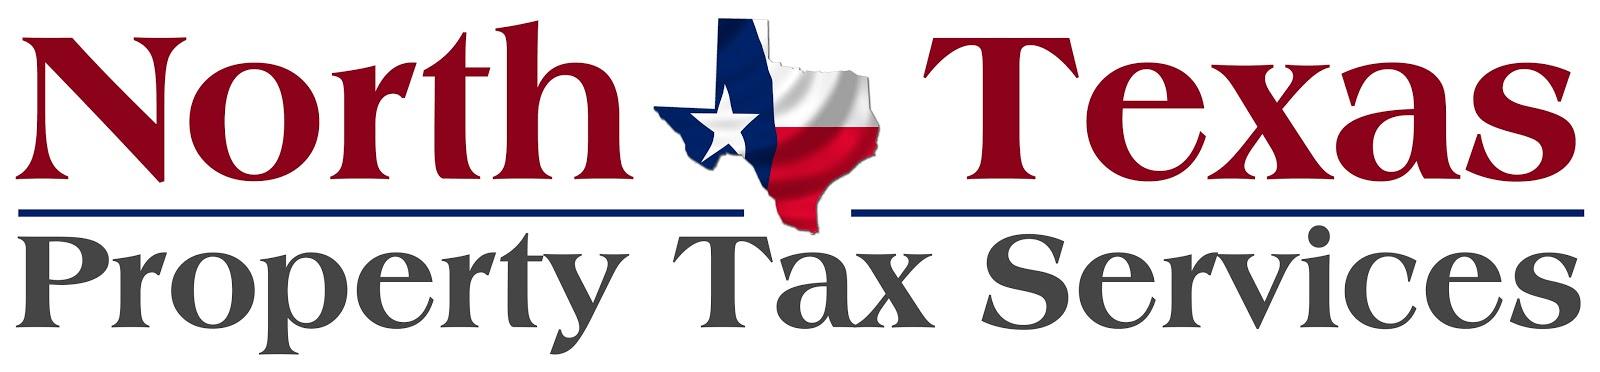 Dallas County Property Tax Appraisal District